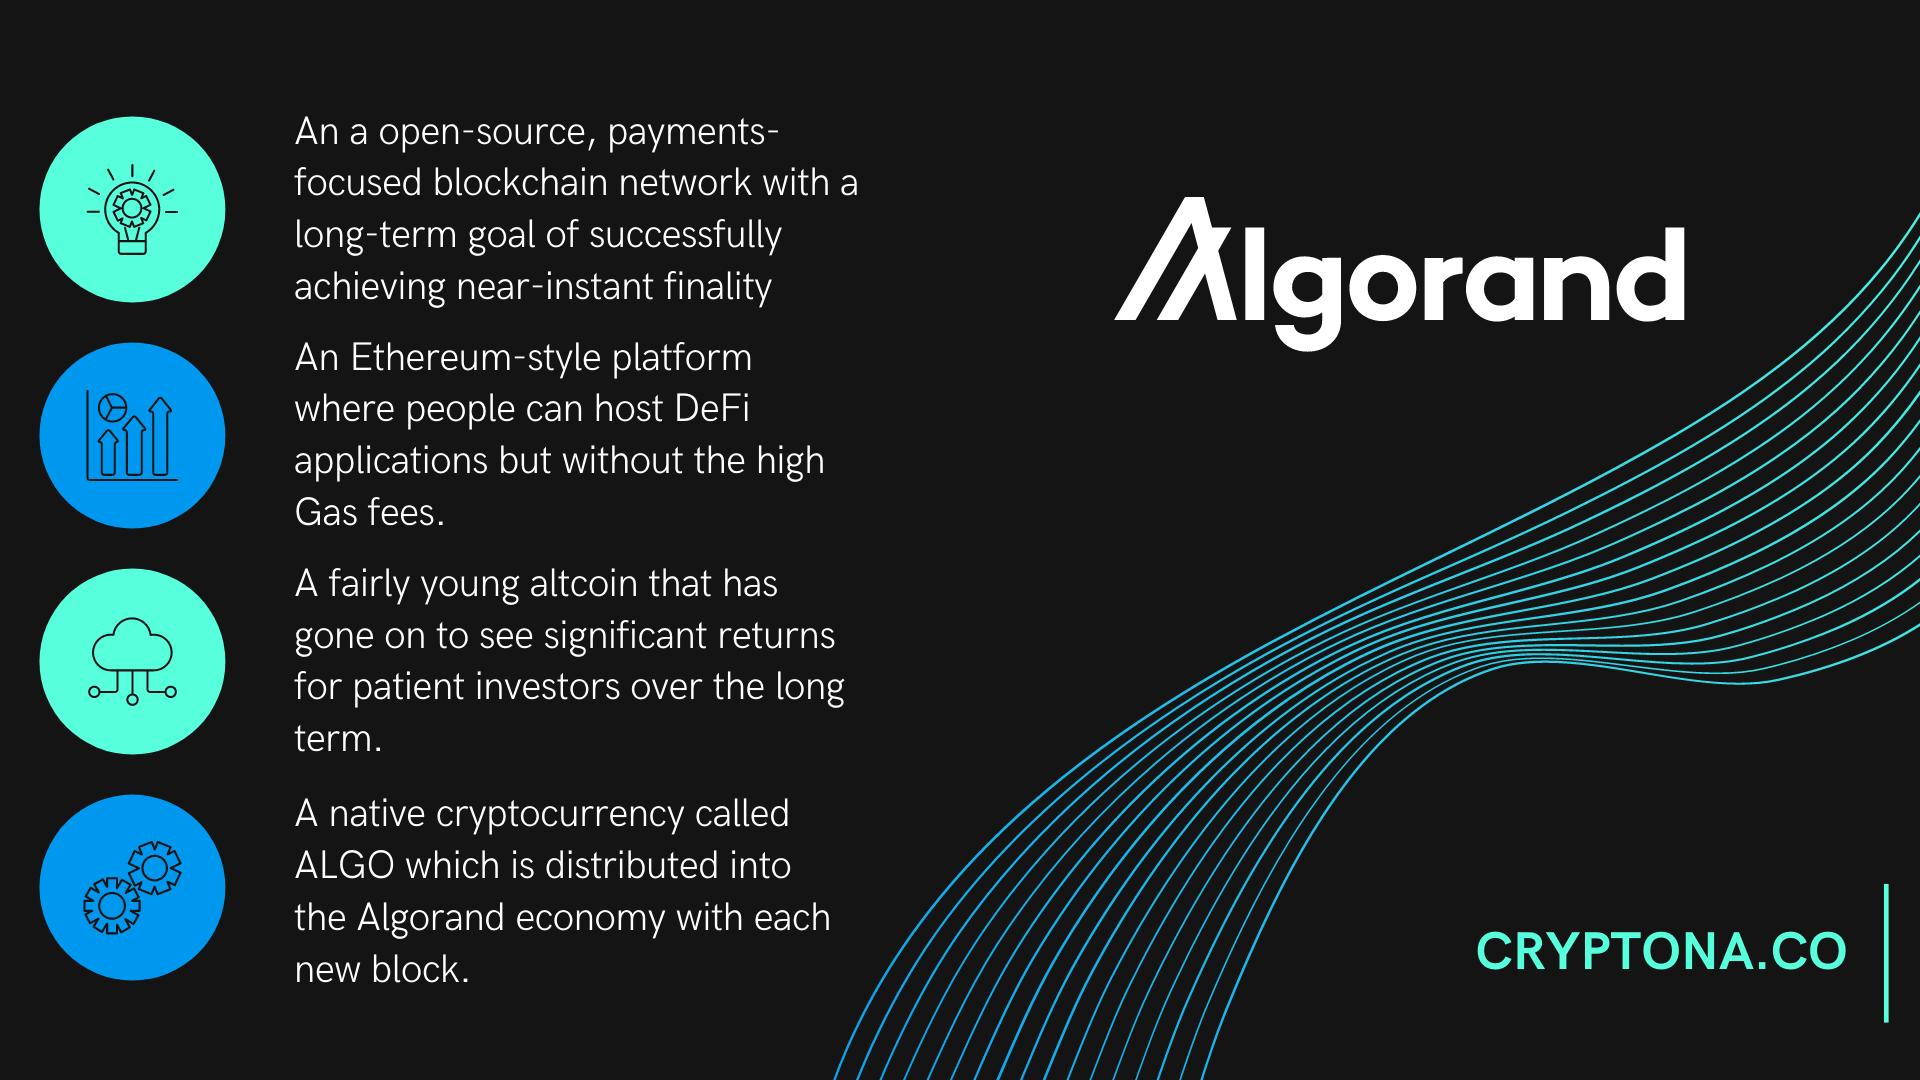 Algorand Price Prediction Forecast 2021-2025